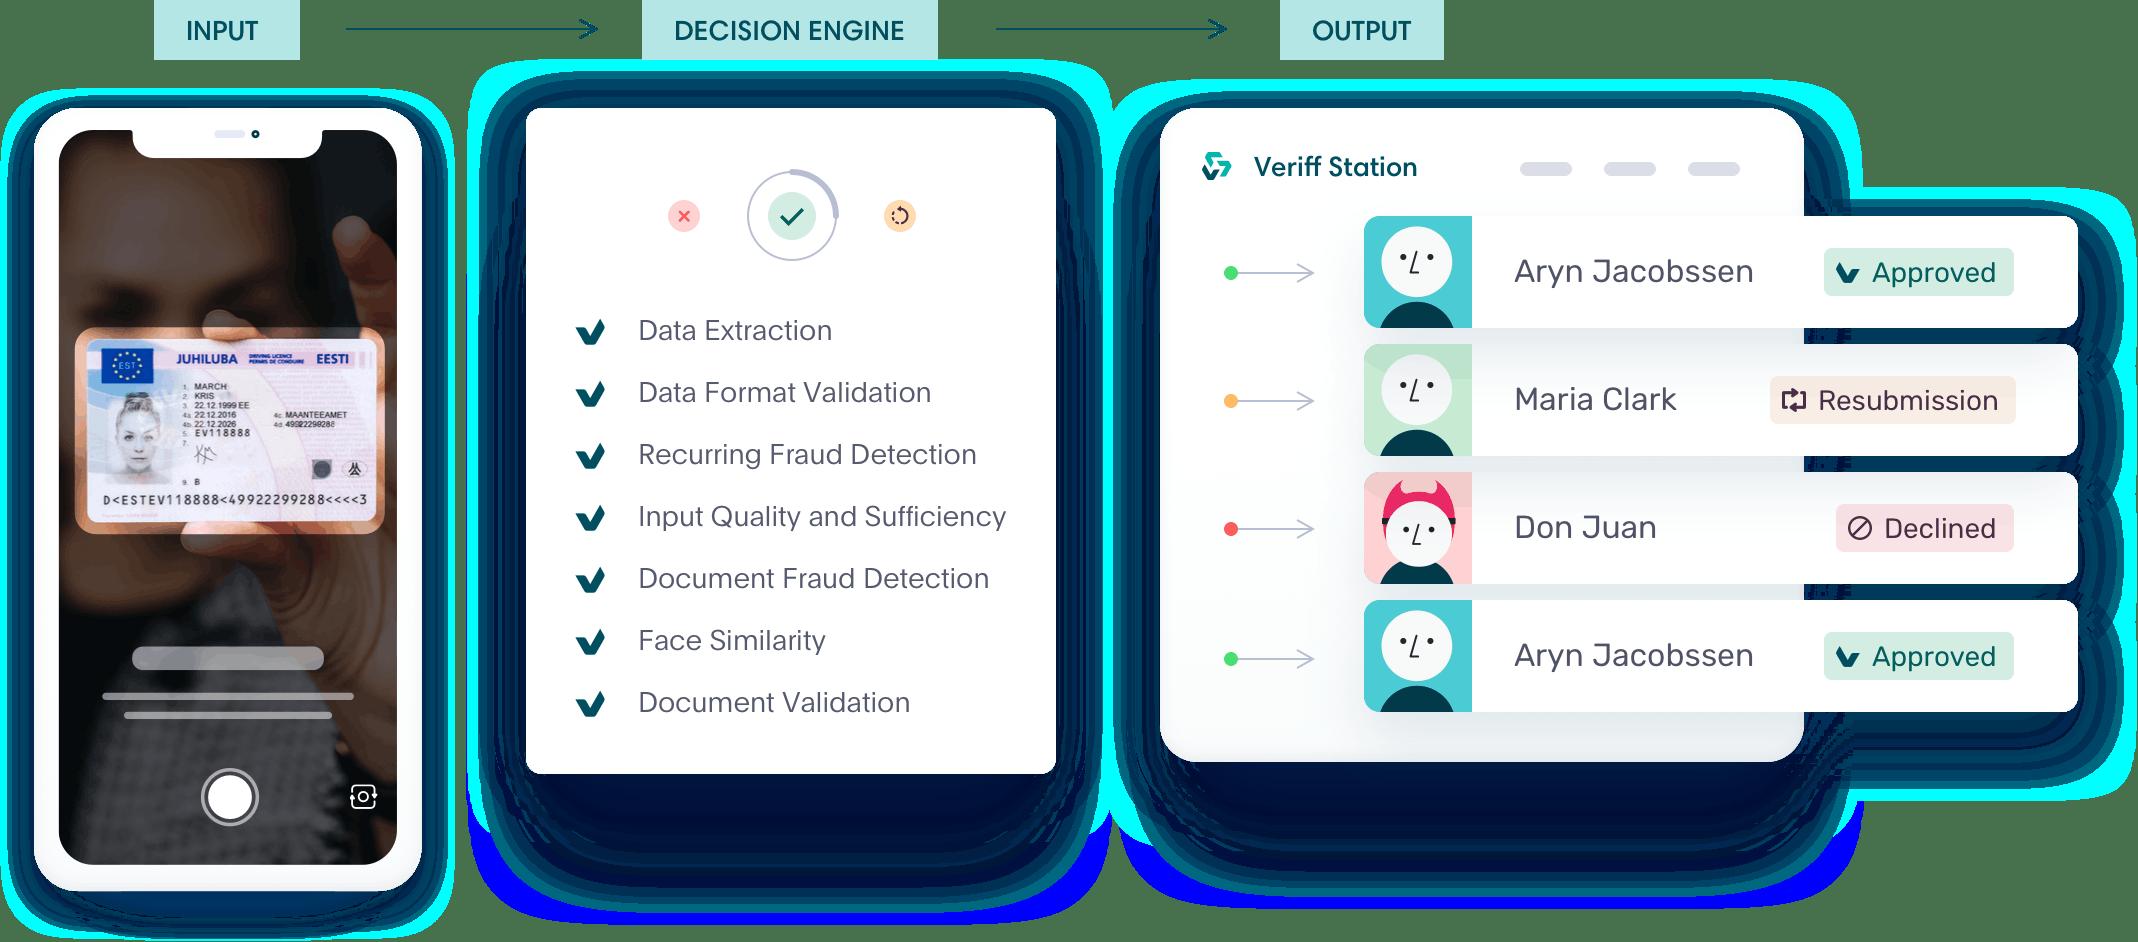 Veriff's Identity Verification Decision Engine